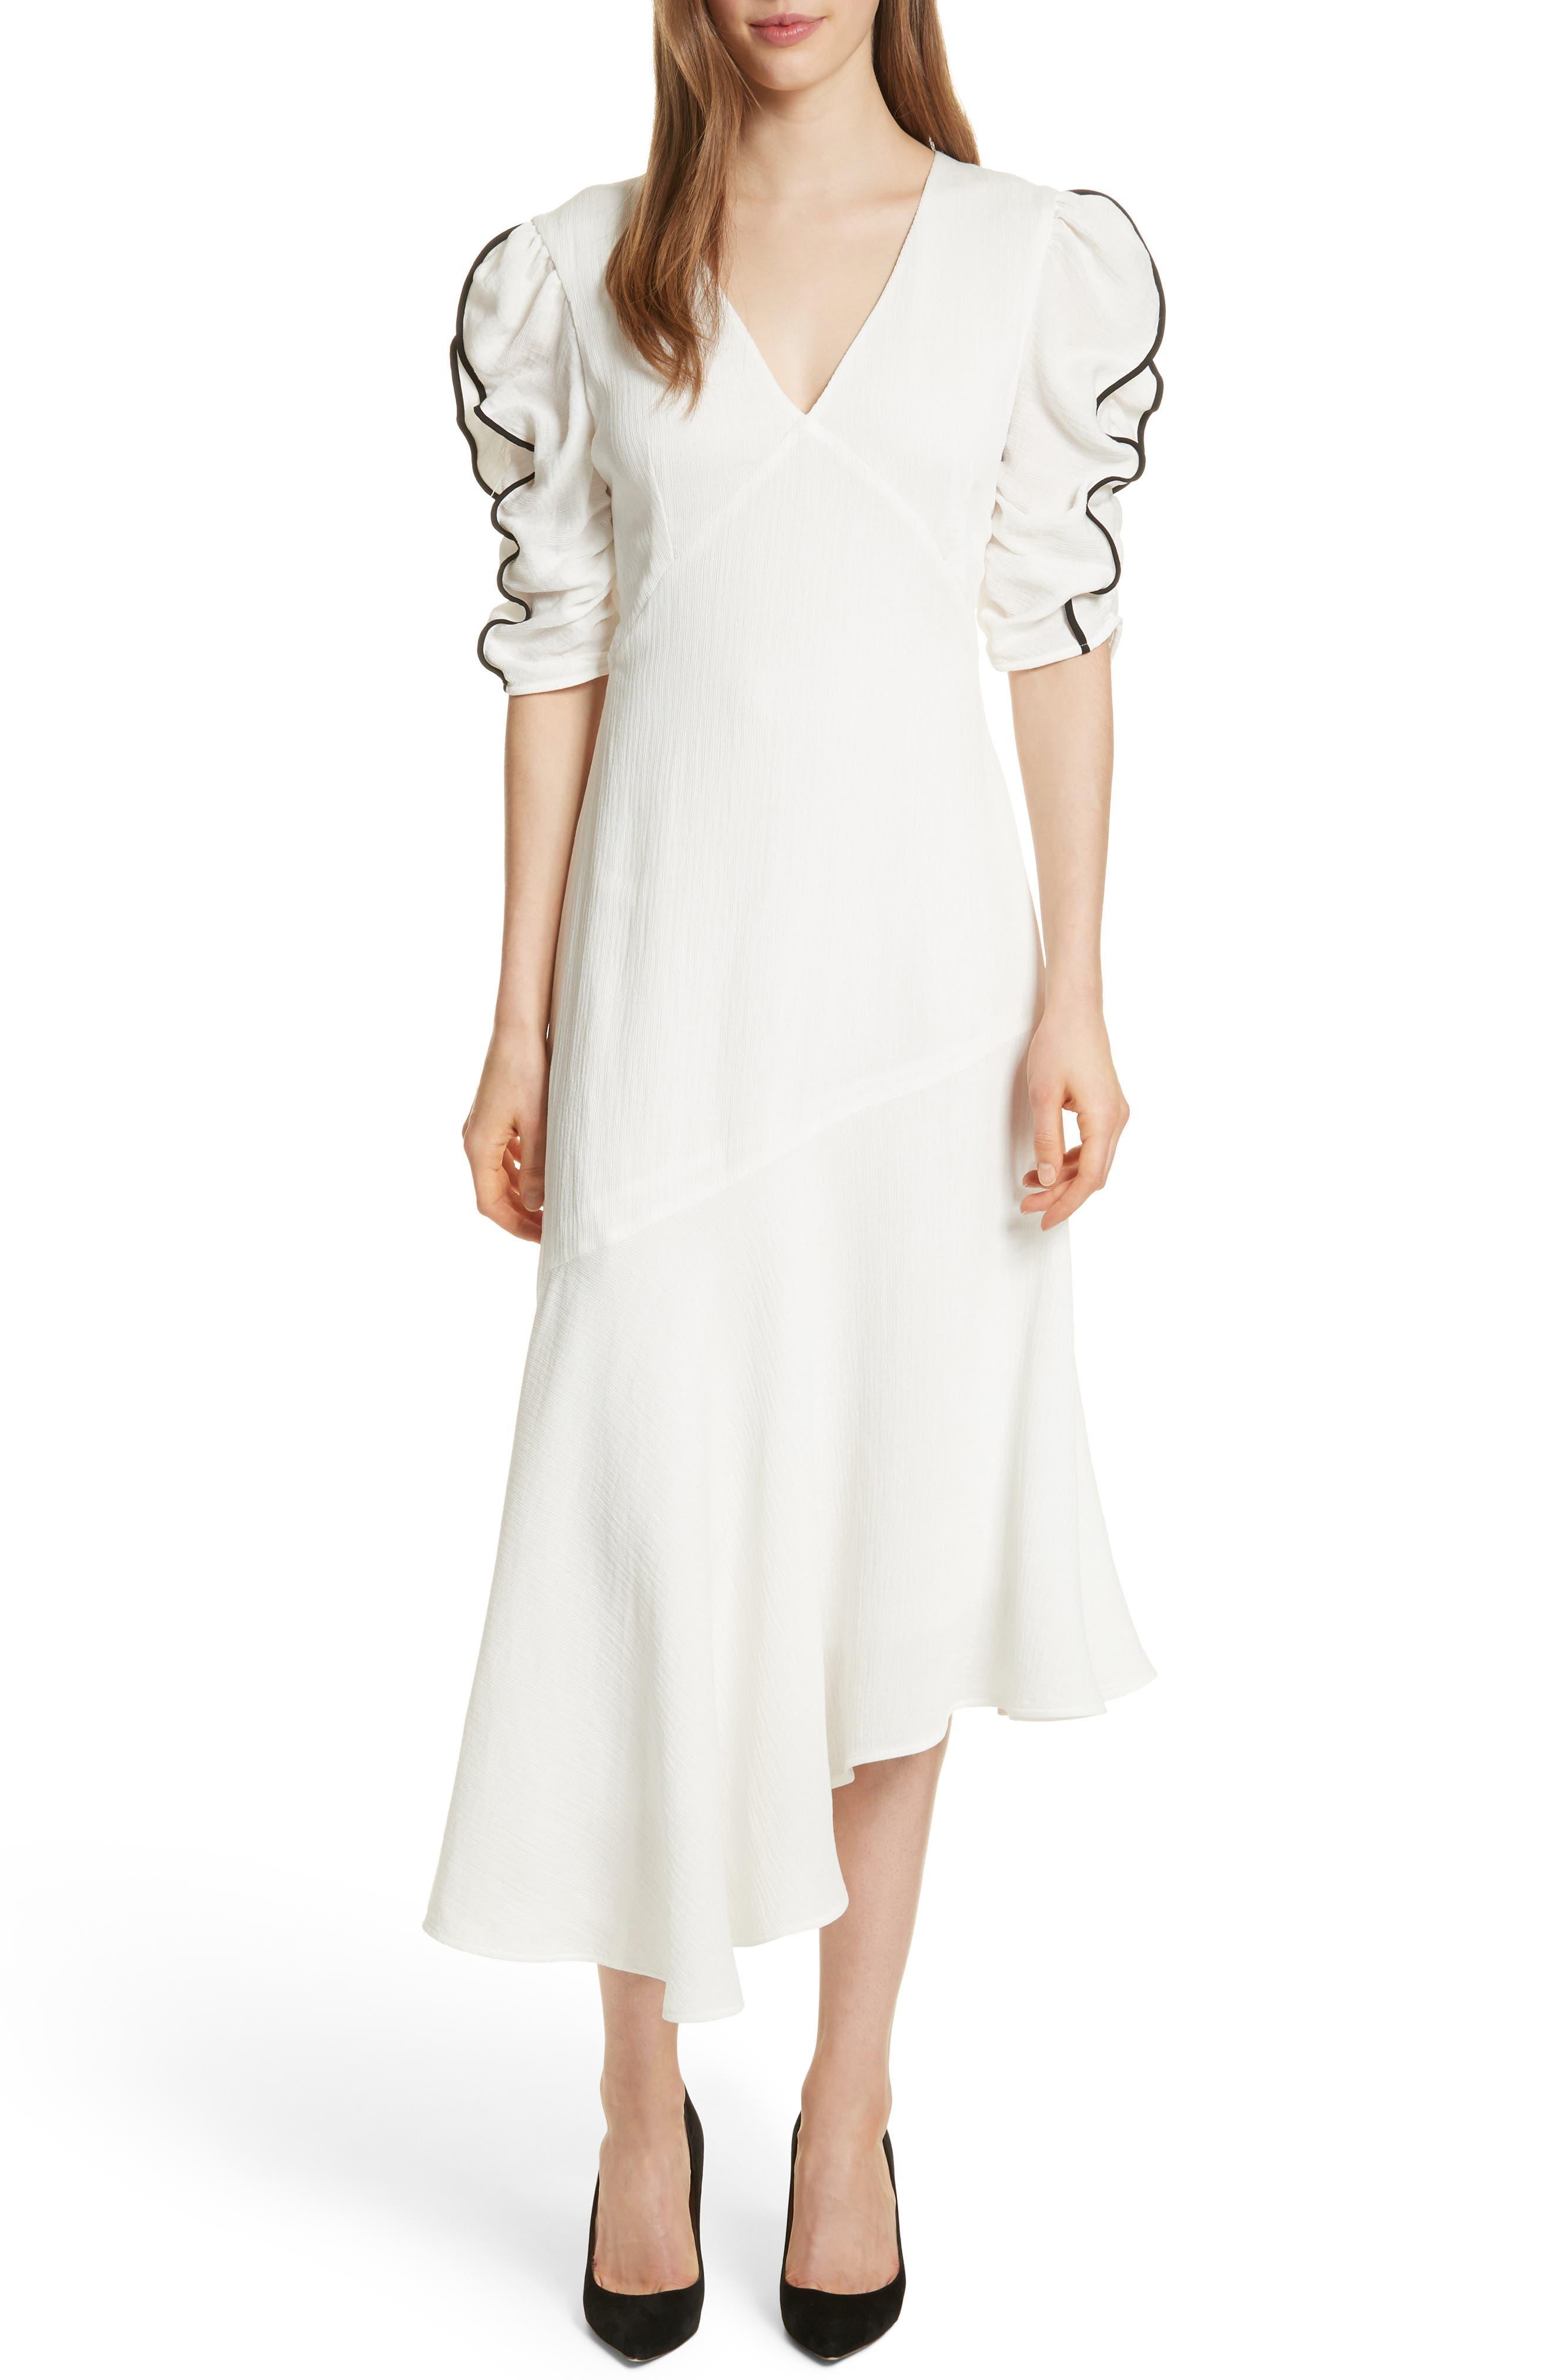 Prose & Poetry Shirley Ruffle Sleeve Midi Dress,                         Main,                         color, 101